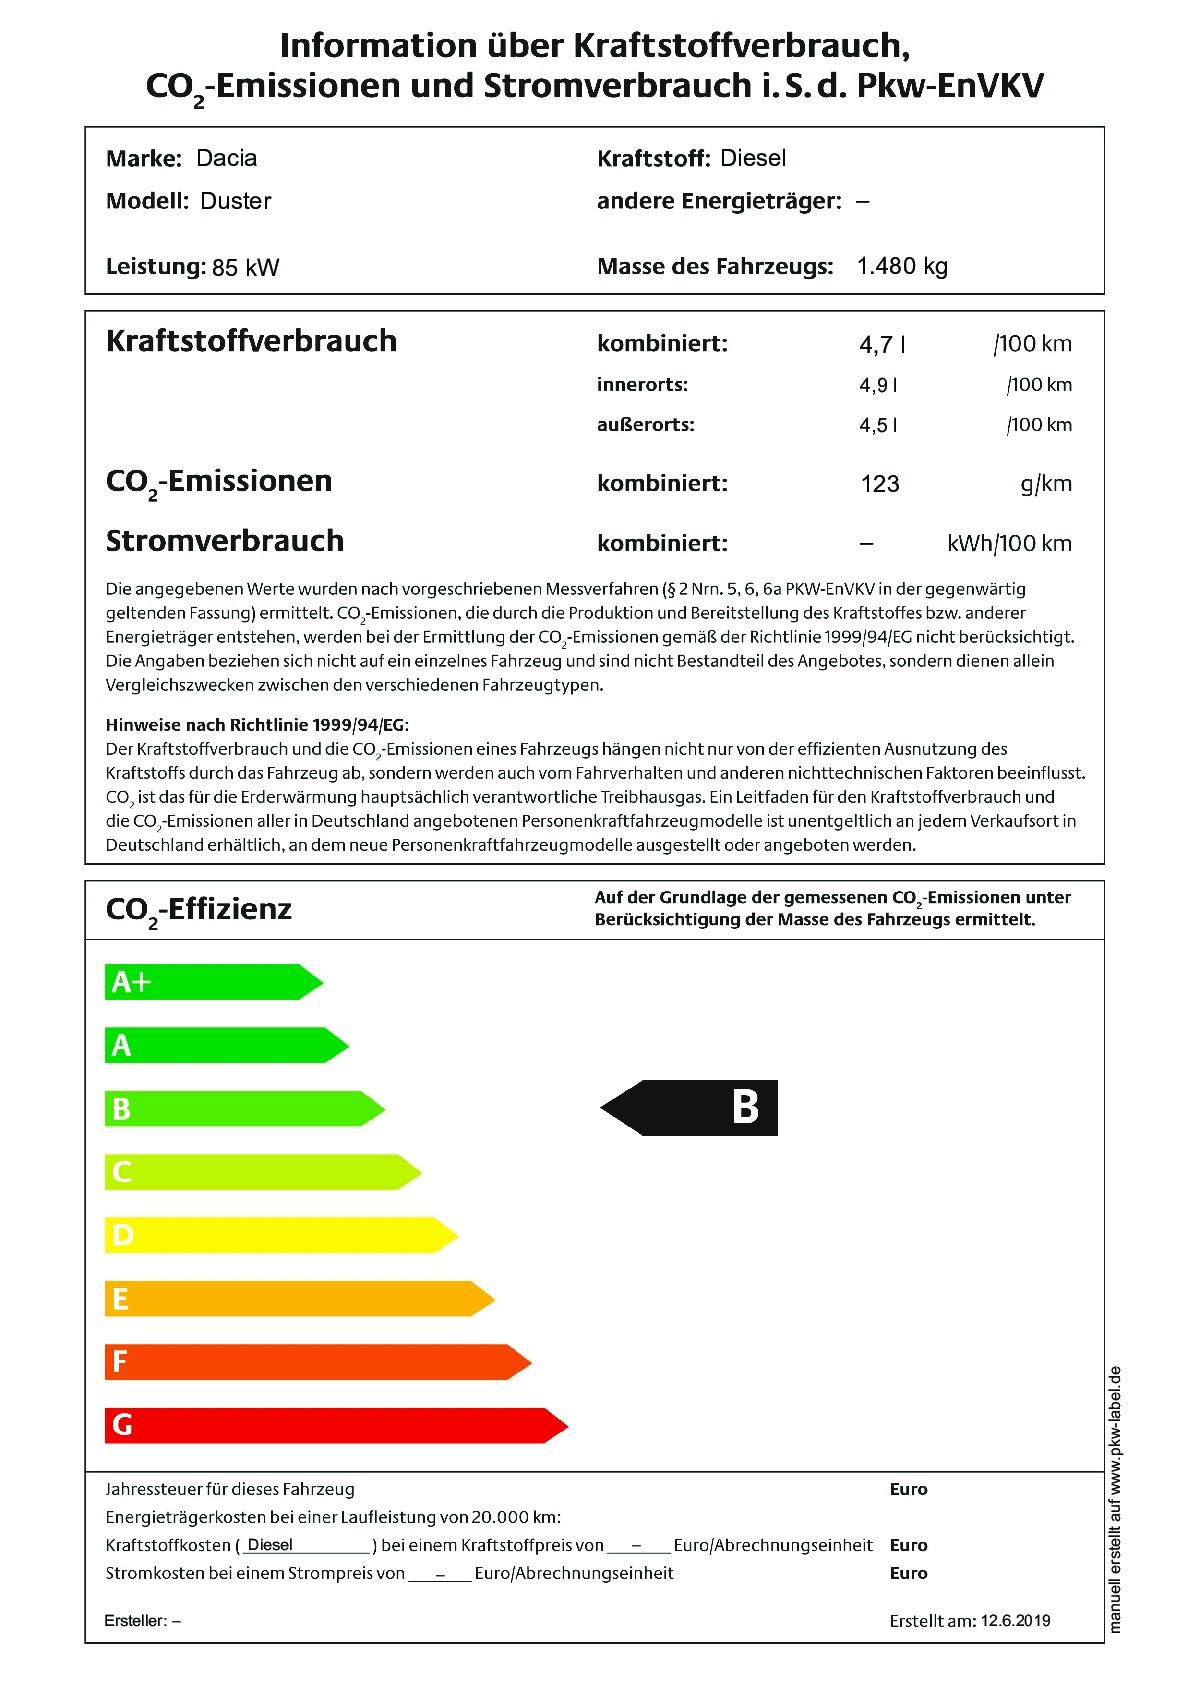 Energielabel Blue dCi 115 4x4